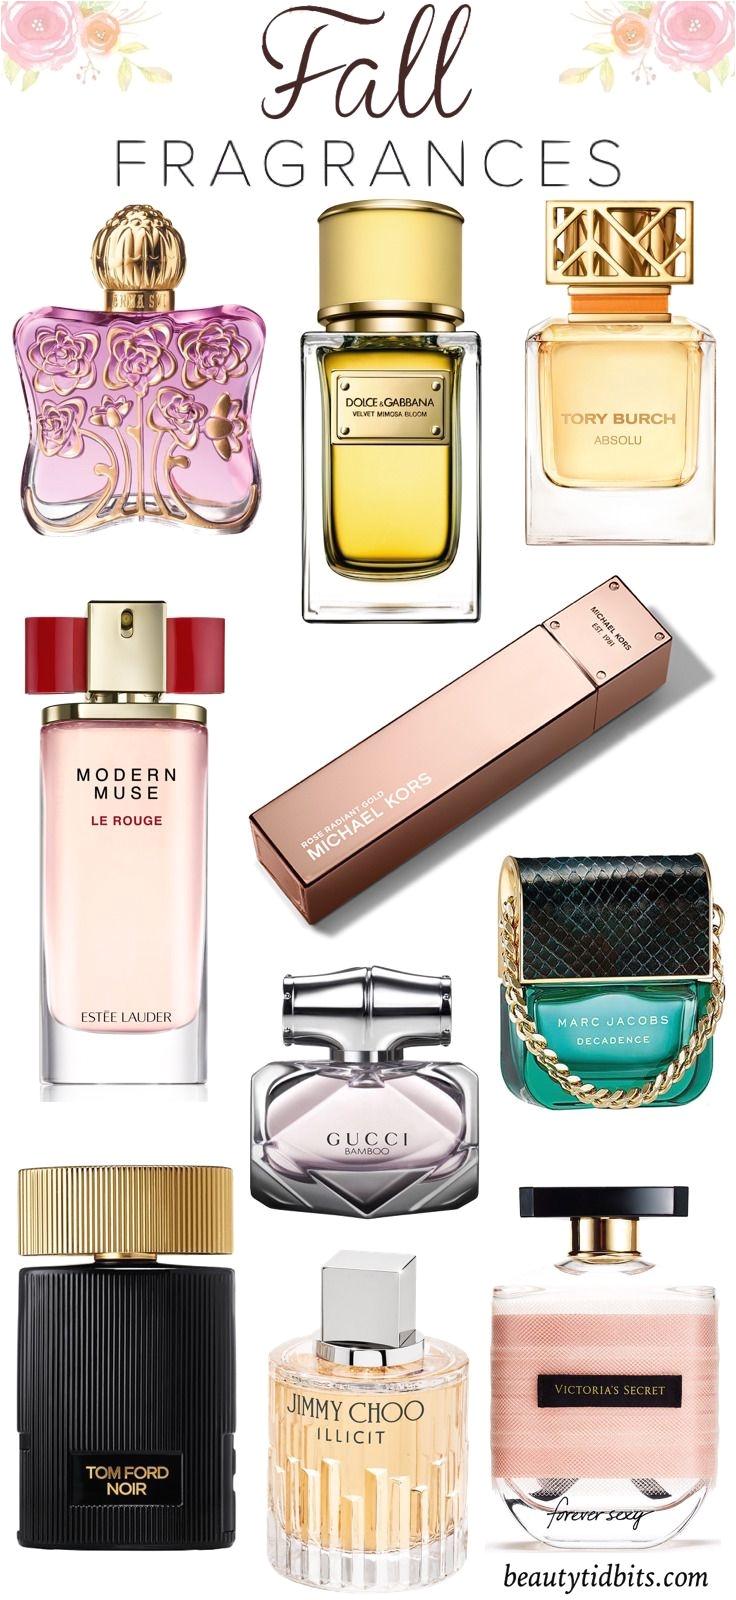 500 best mmmm perfumes images on pinterest fragrance perfume bottles and eau de toilette